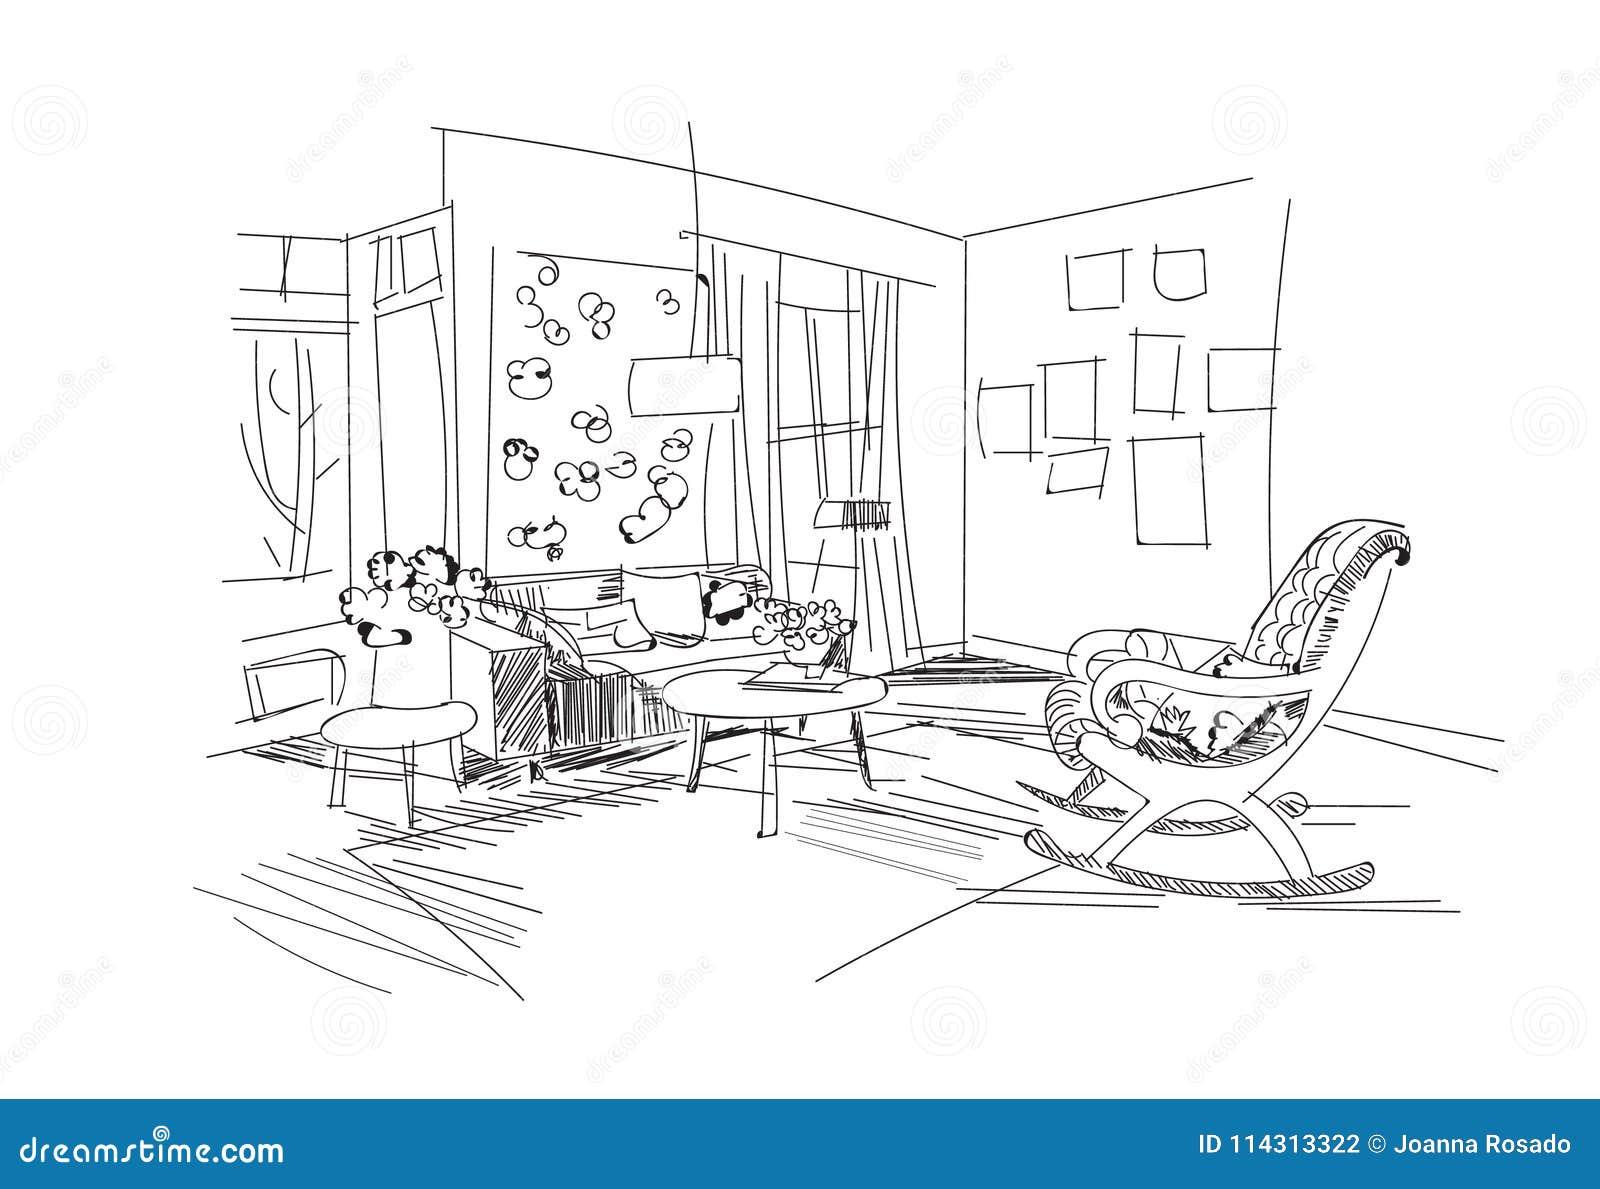 Download Vector Interior Design Illustrationliving Room Furniture Hand Drawn Watercolor Sketch Mid